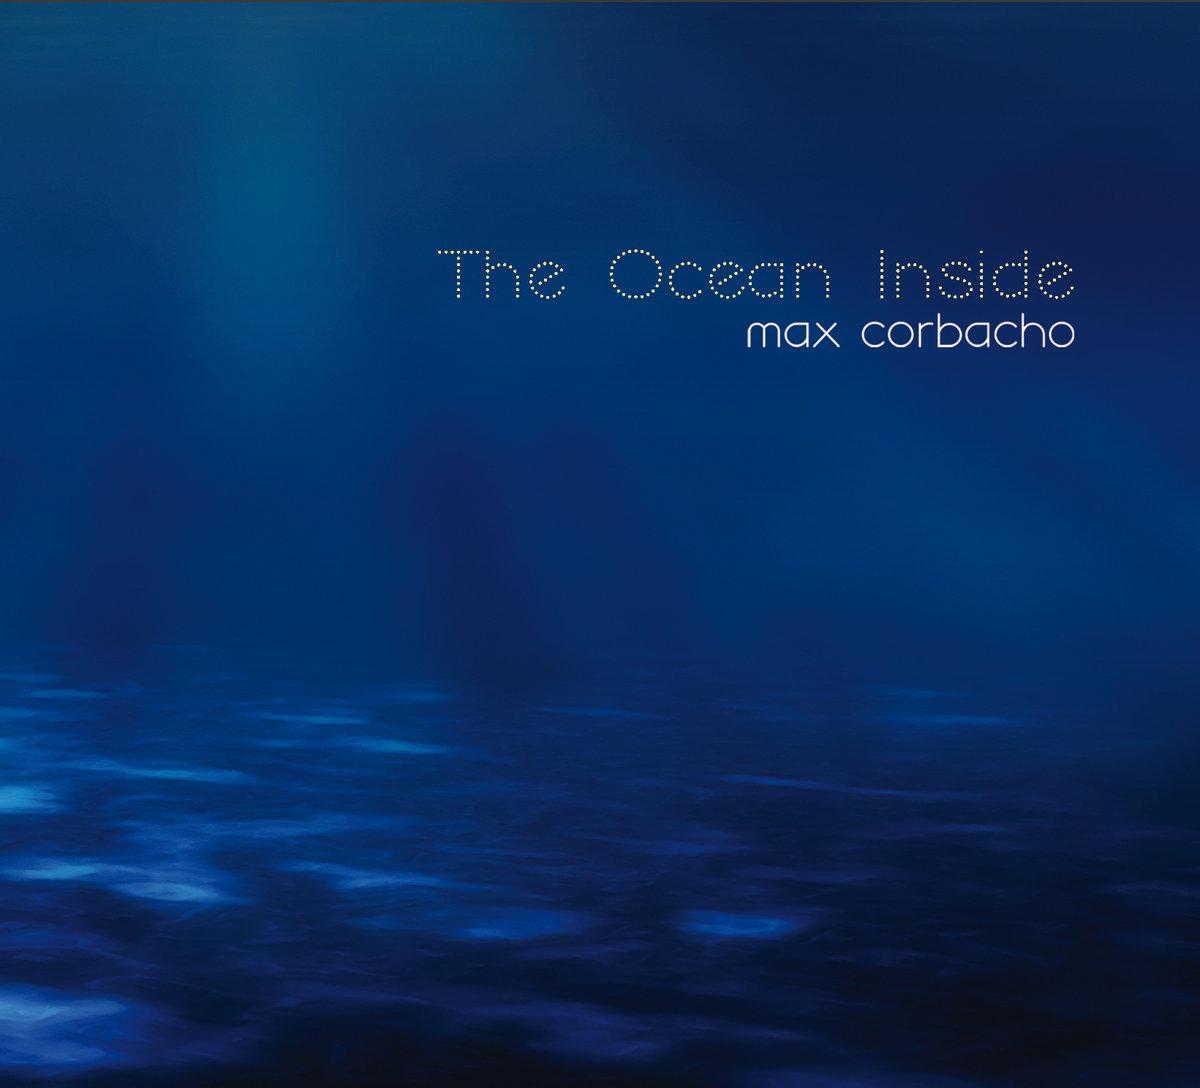 max corbacho the ocean inside